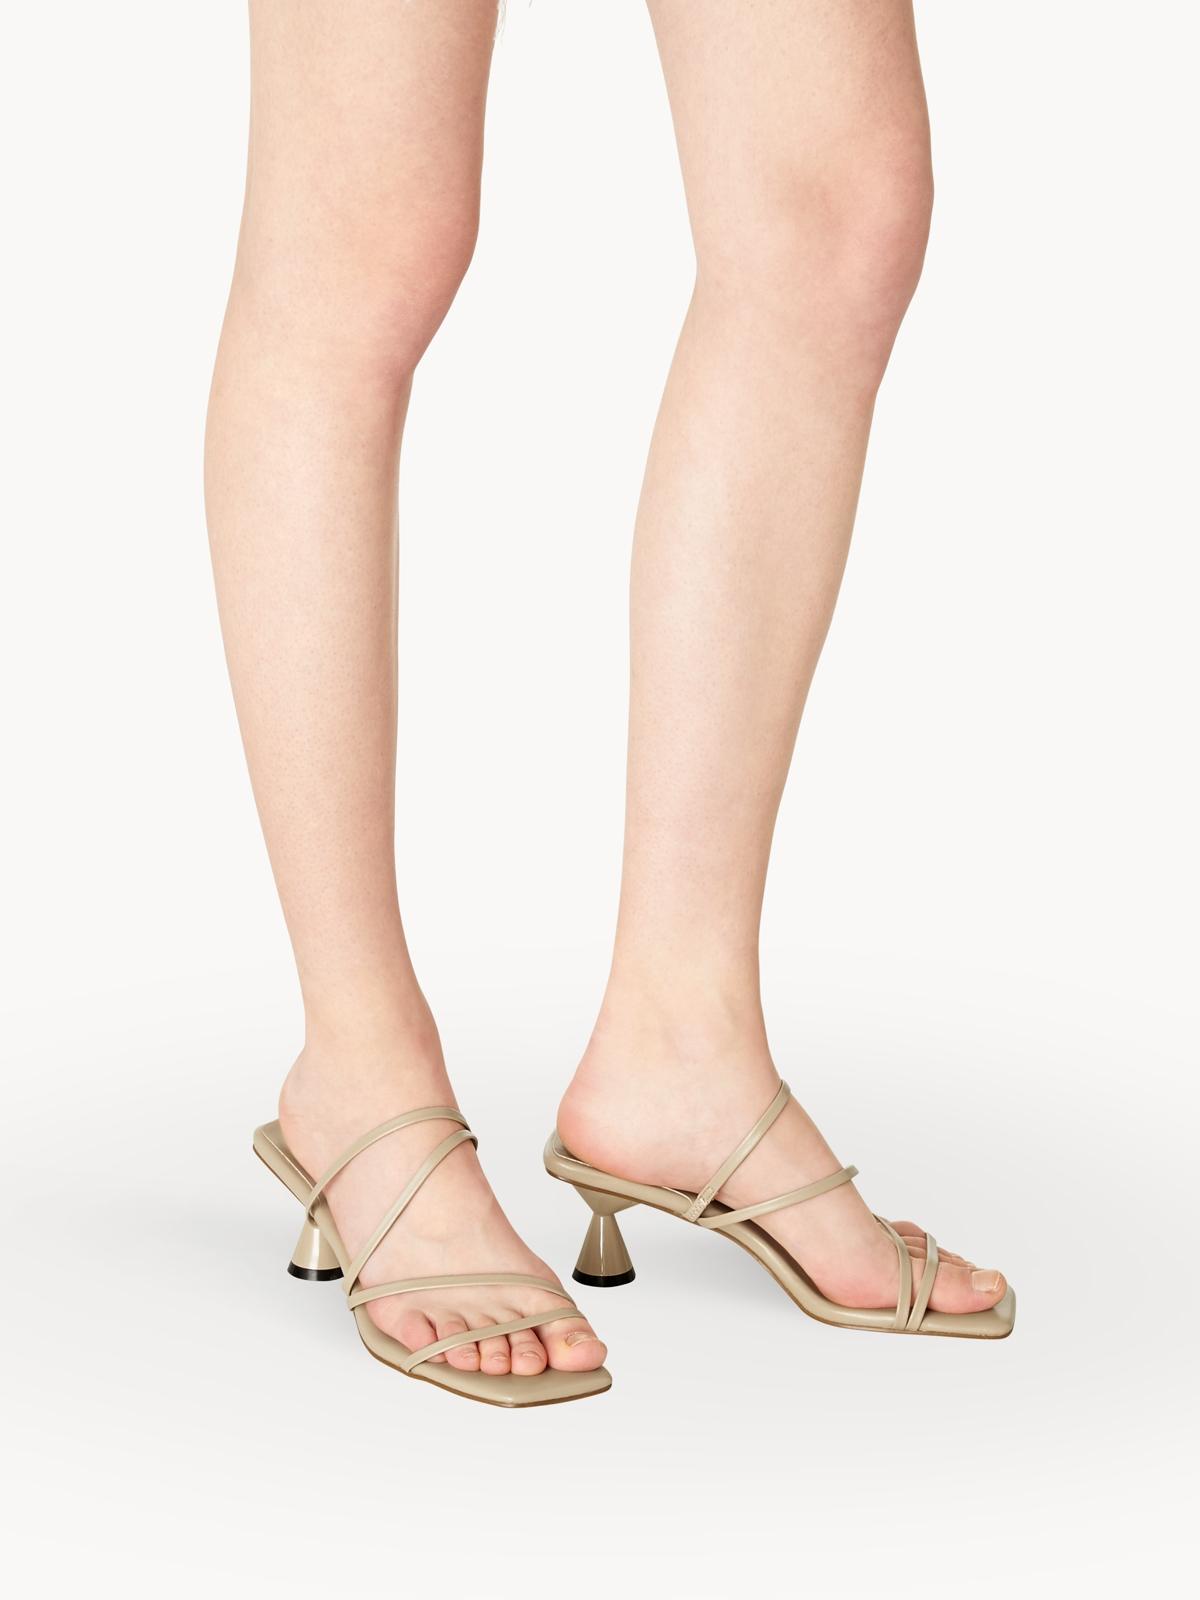 MINX Vera Strappy Open Toe Heels Taupe